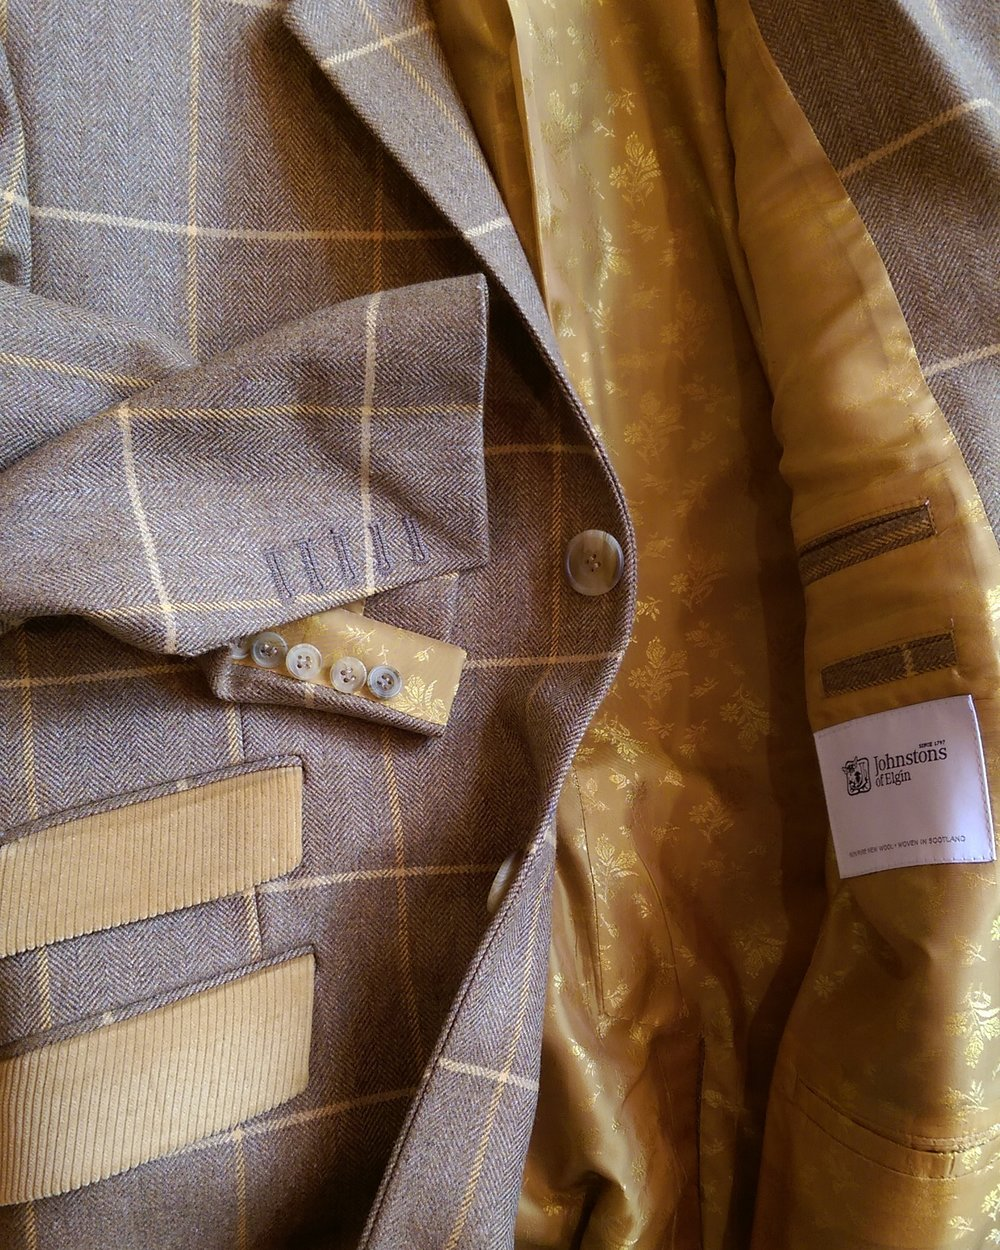 bespoke-all-uk-made-british-coat-overcoat-tweed-johnstons-of-elgin-cord-mustard-paisley-lining-cuff-detail-horn-buttons.jpg